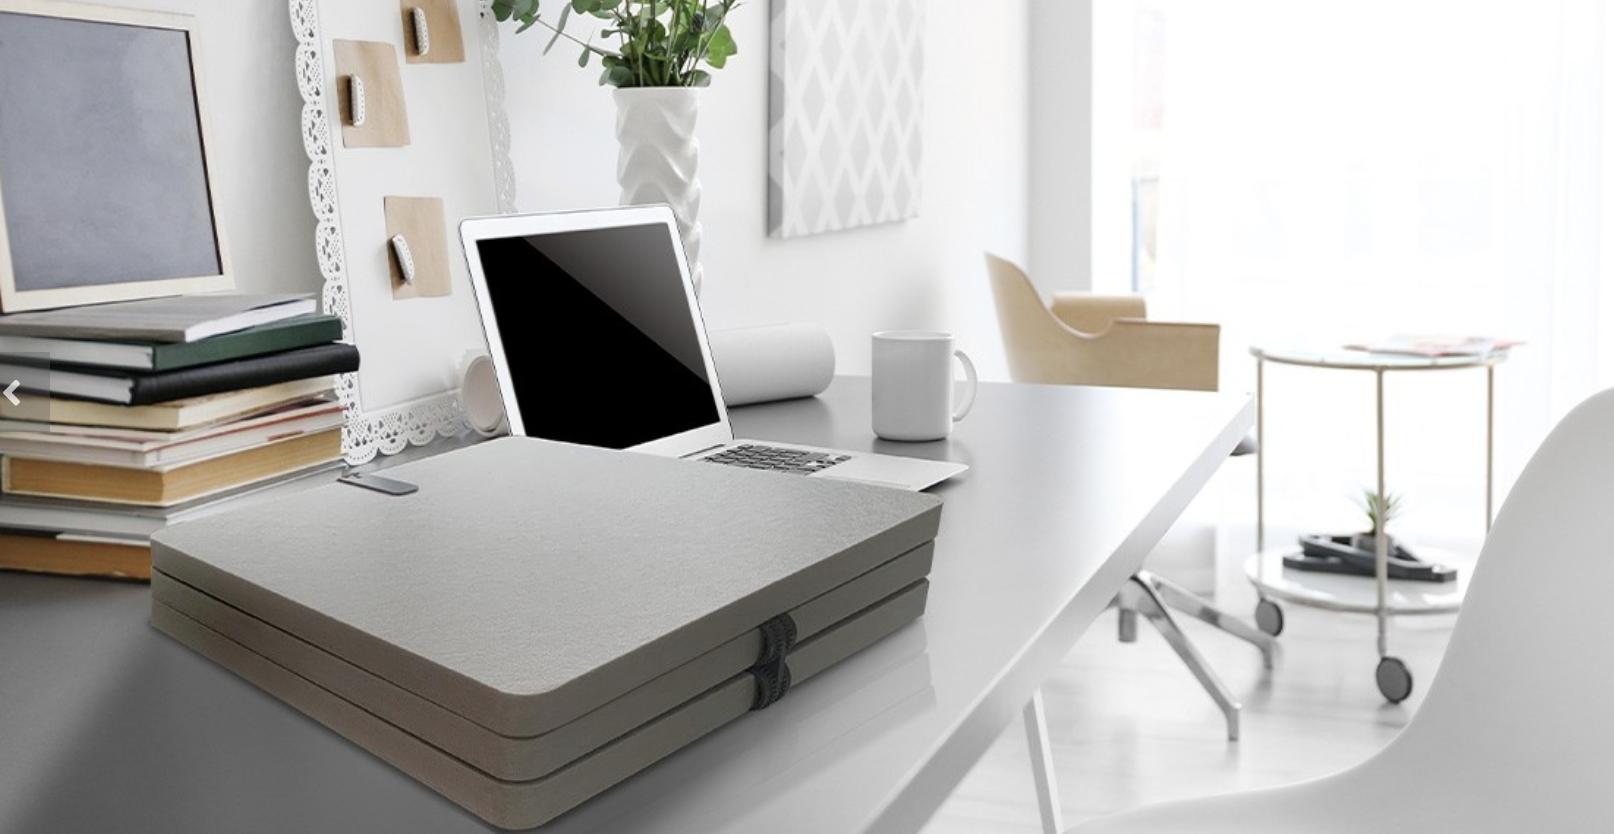 Desktop folds flat for easy storage